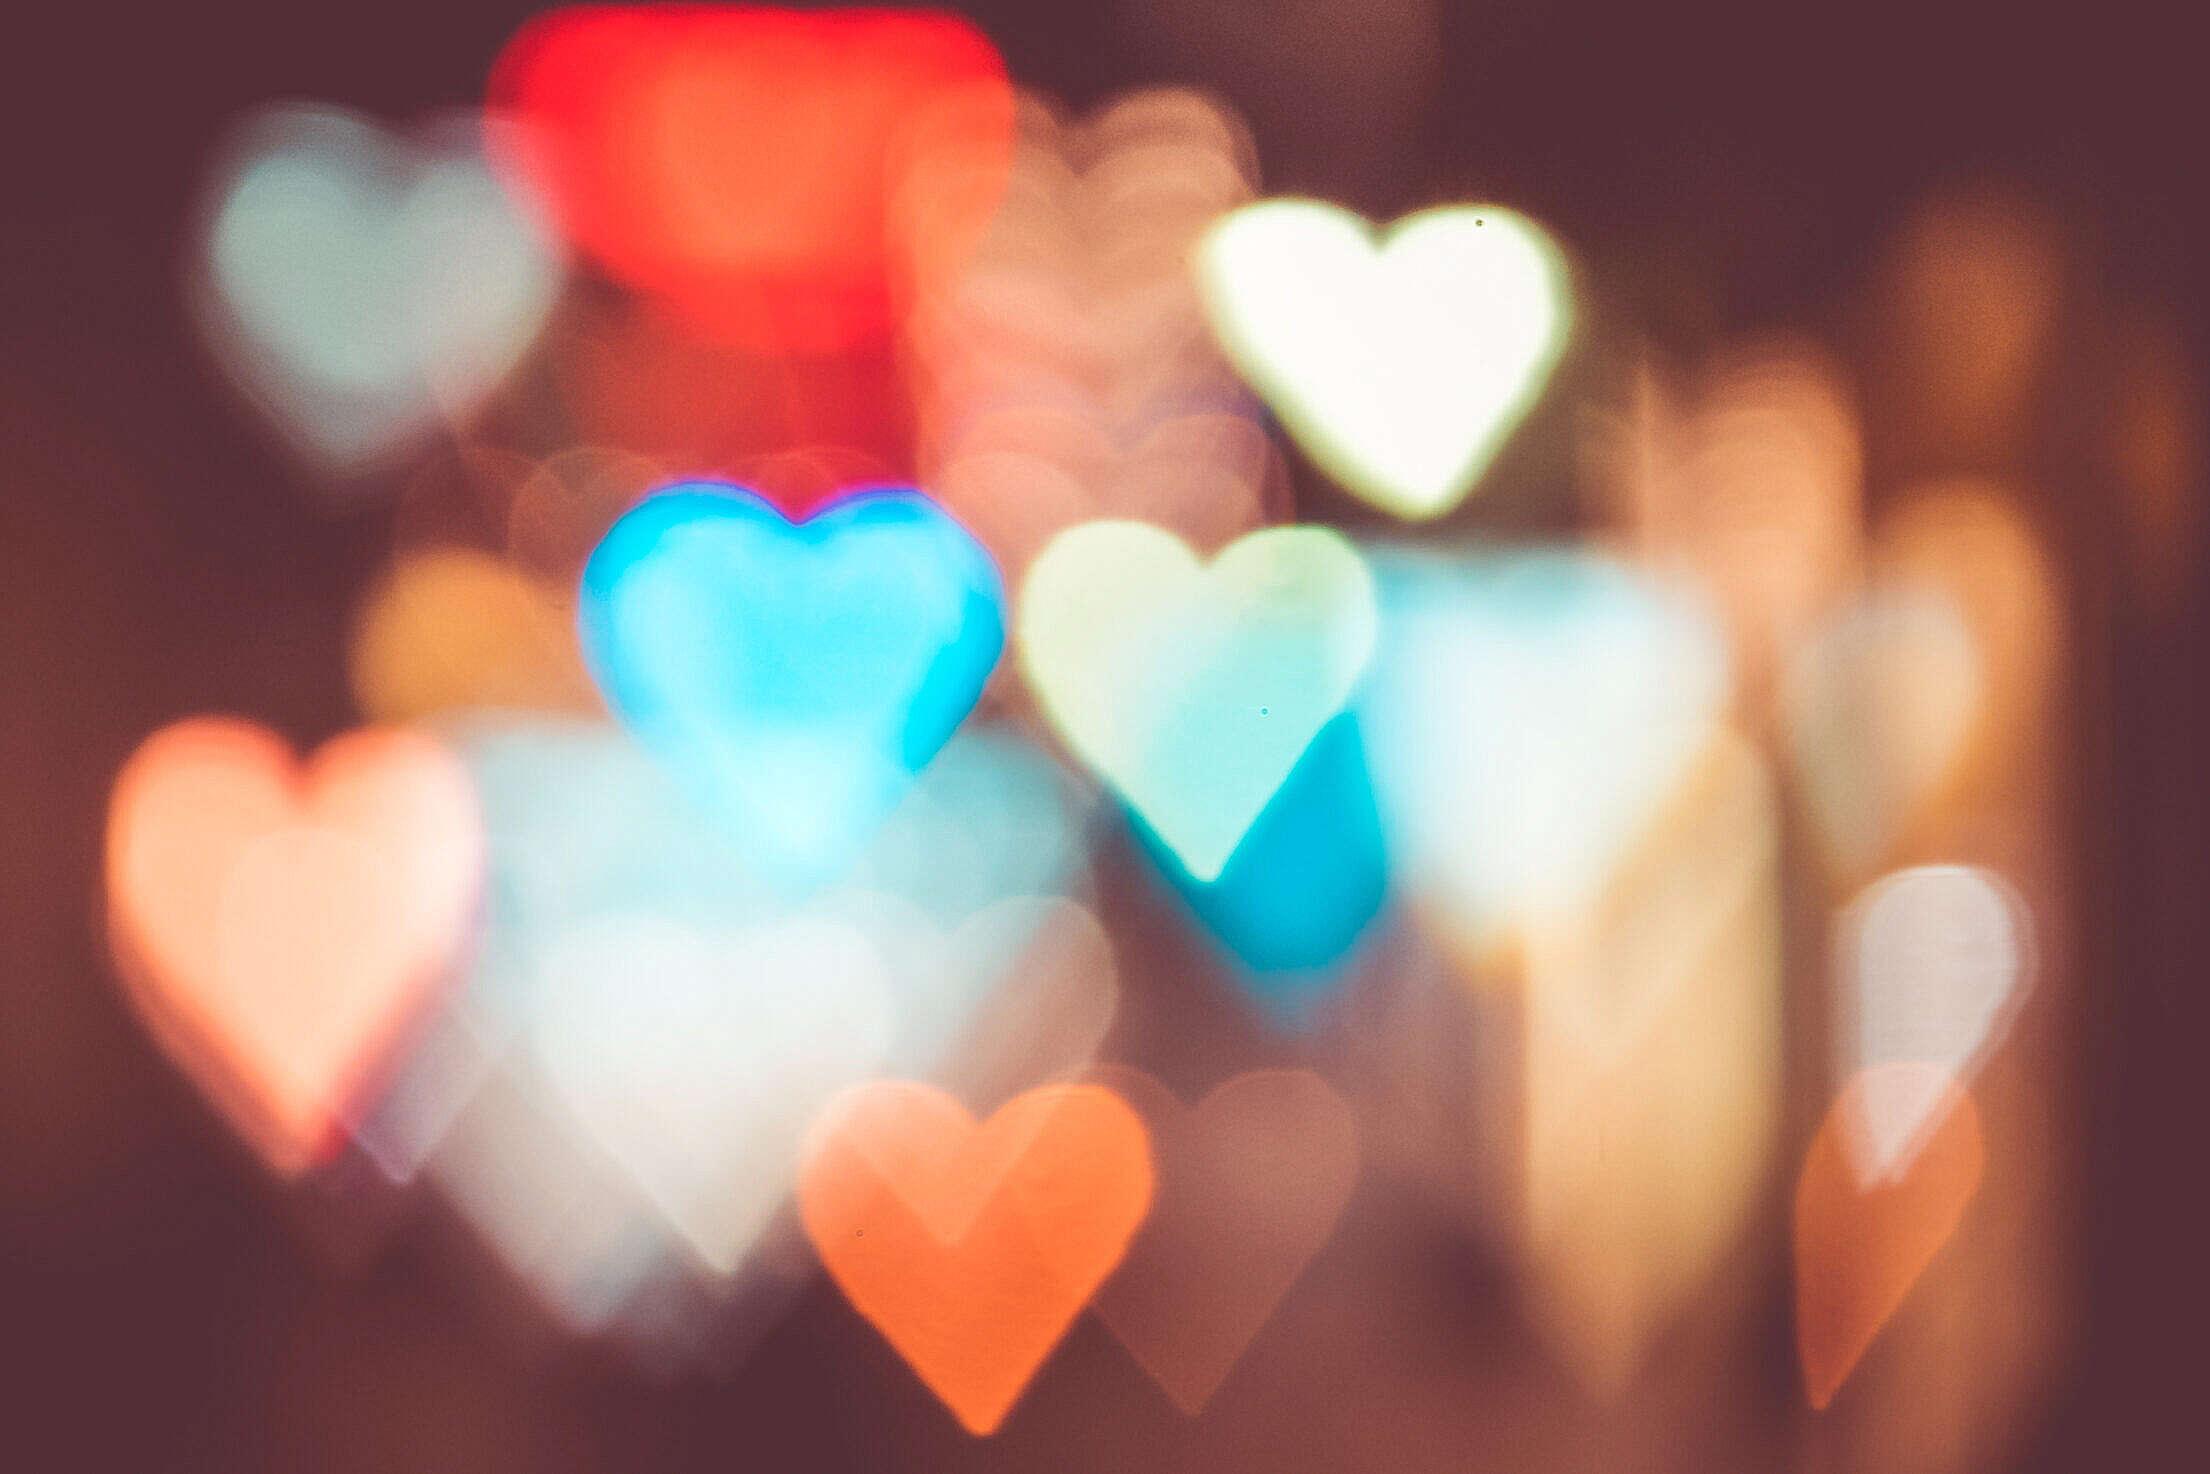 Night City Lights Abstract Heart Bokeh Trick Free Stock Photo